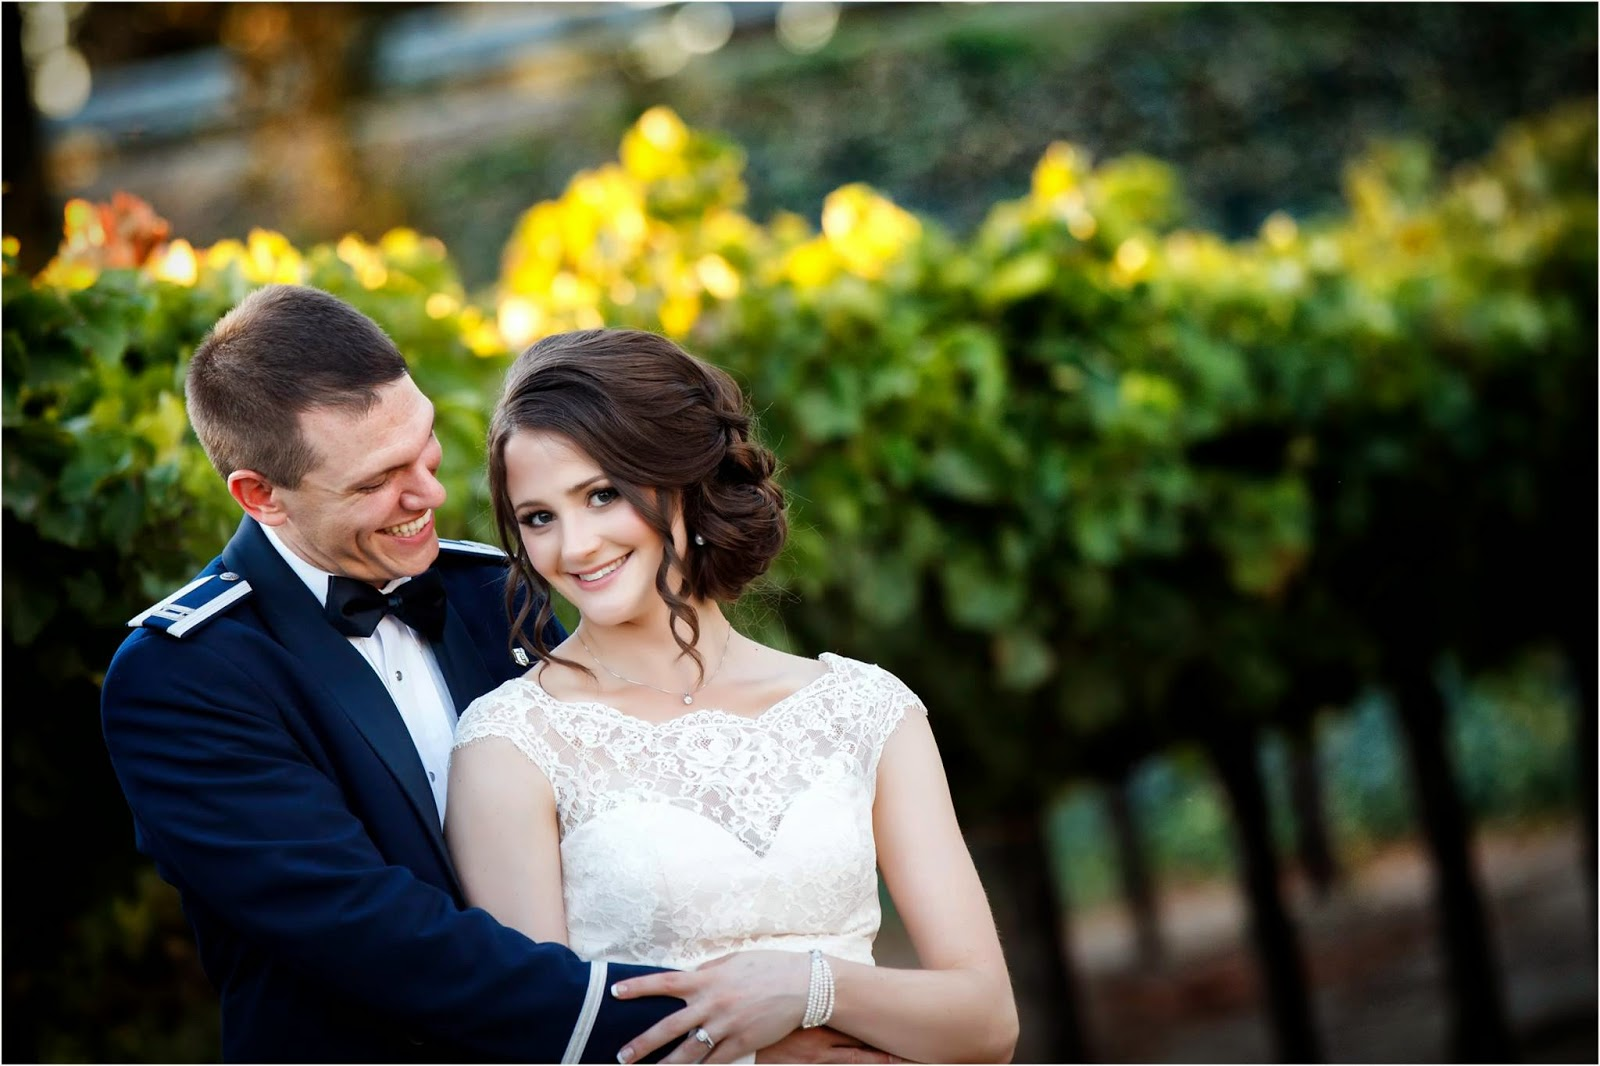 Bridal Makeup Wedding Scribner Bend Siegels Portraits Christi Reynolds Beauty